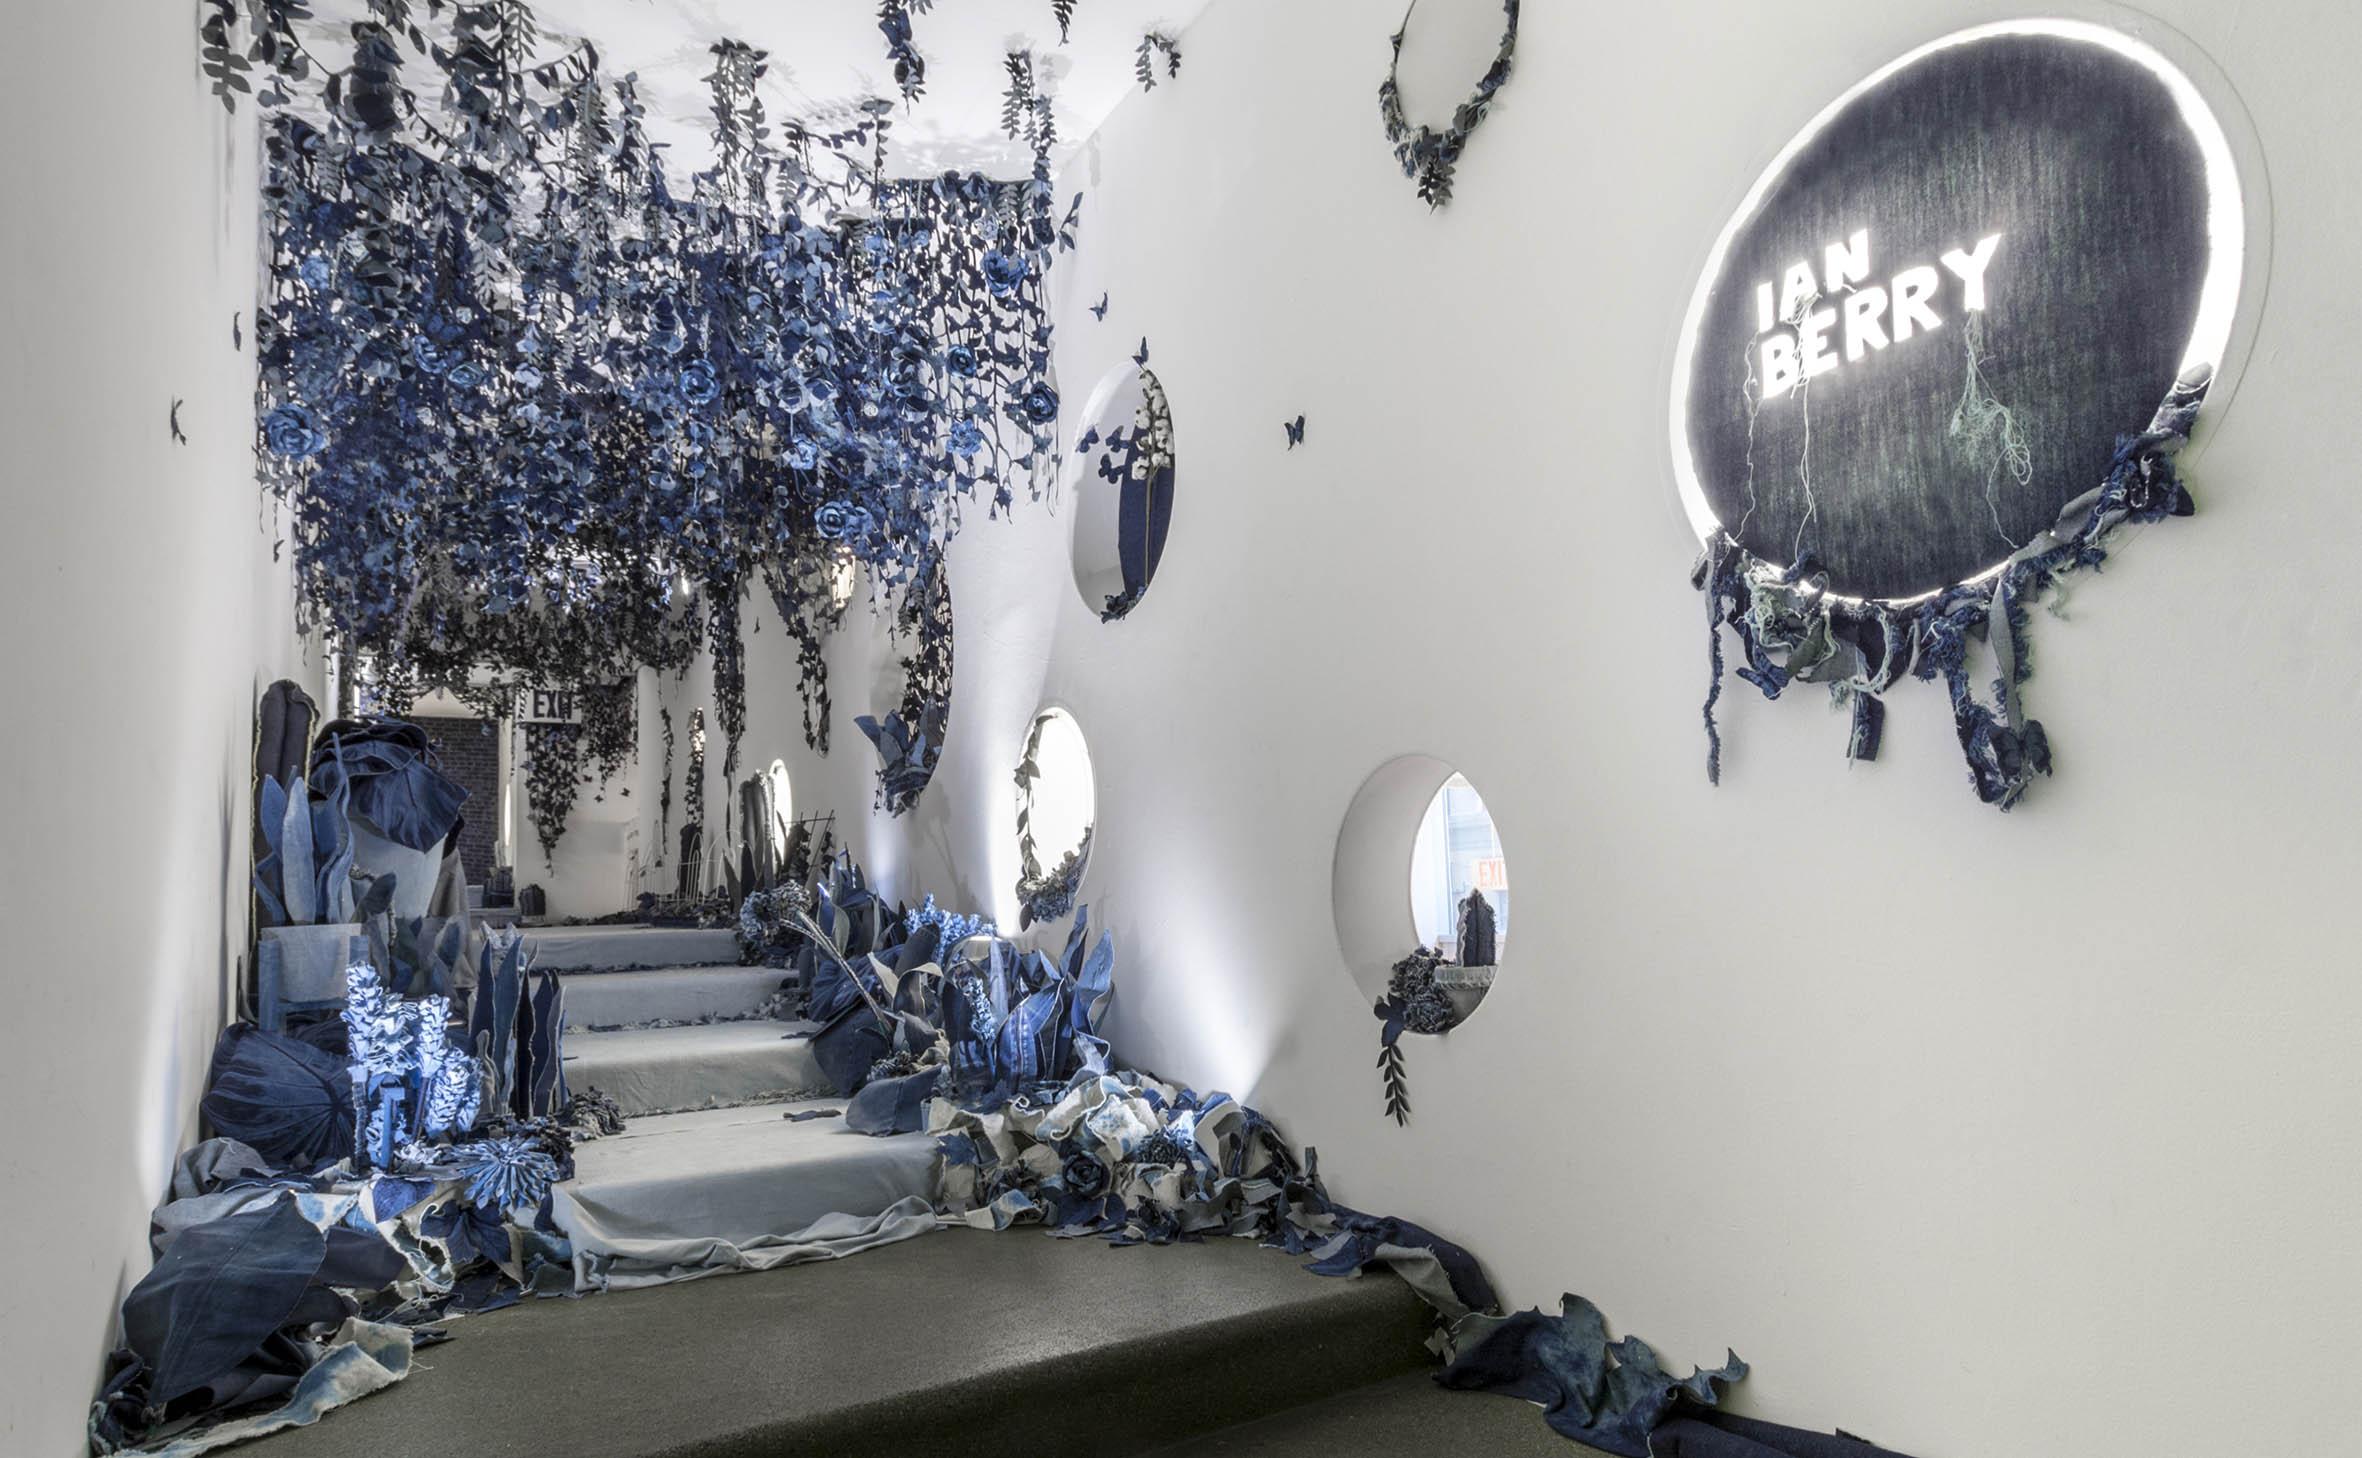 Ian Berry New York Museum